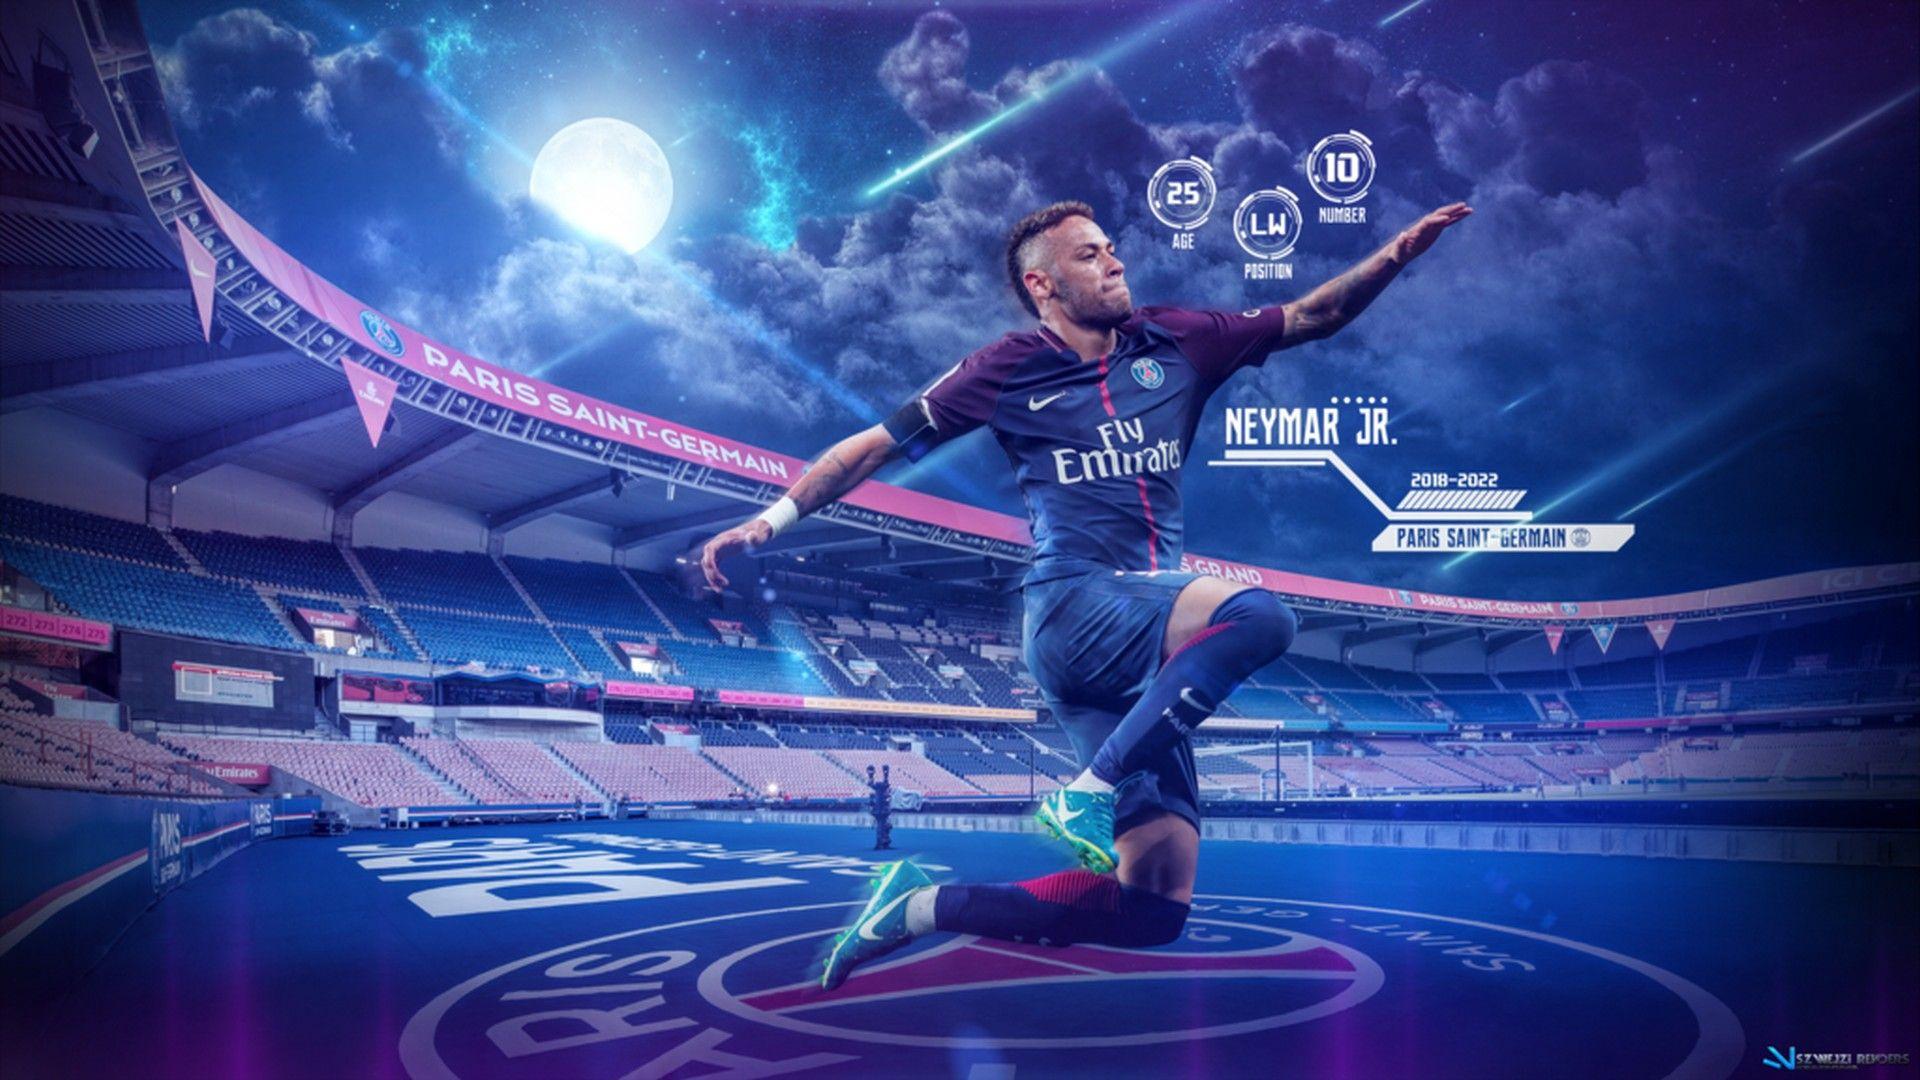 neymar psg hd wallpaper - 2018 wallpapers hd | neymar jr